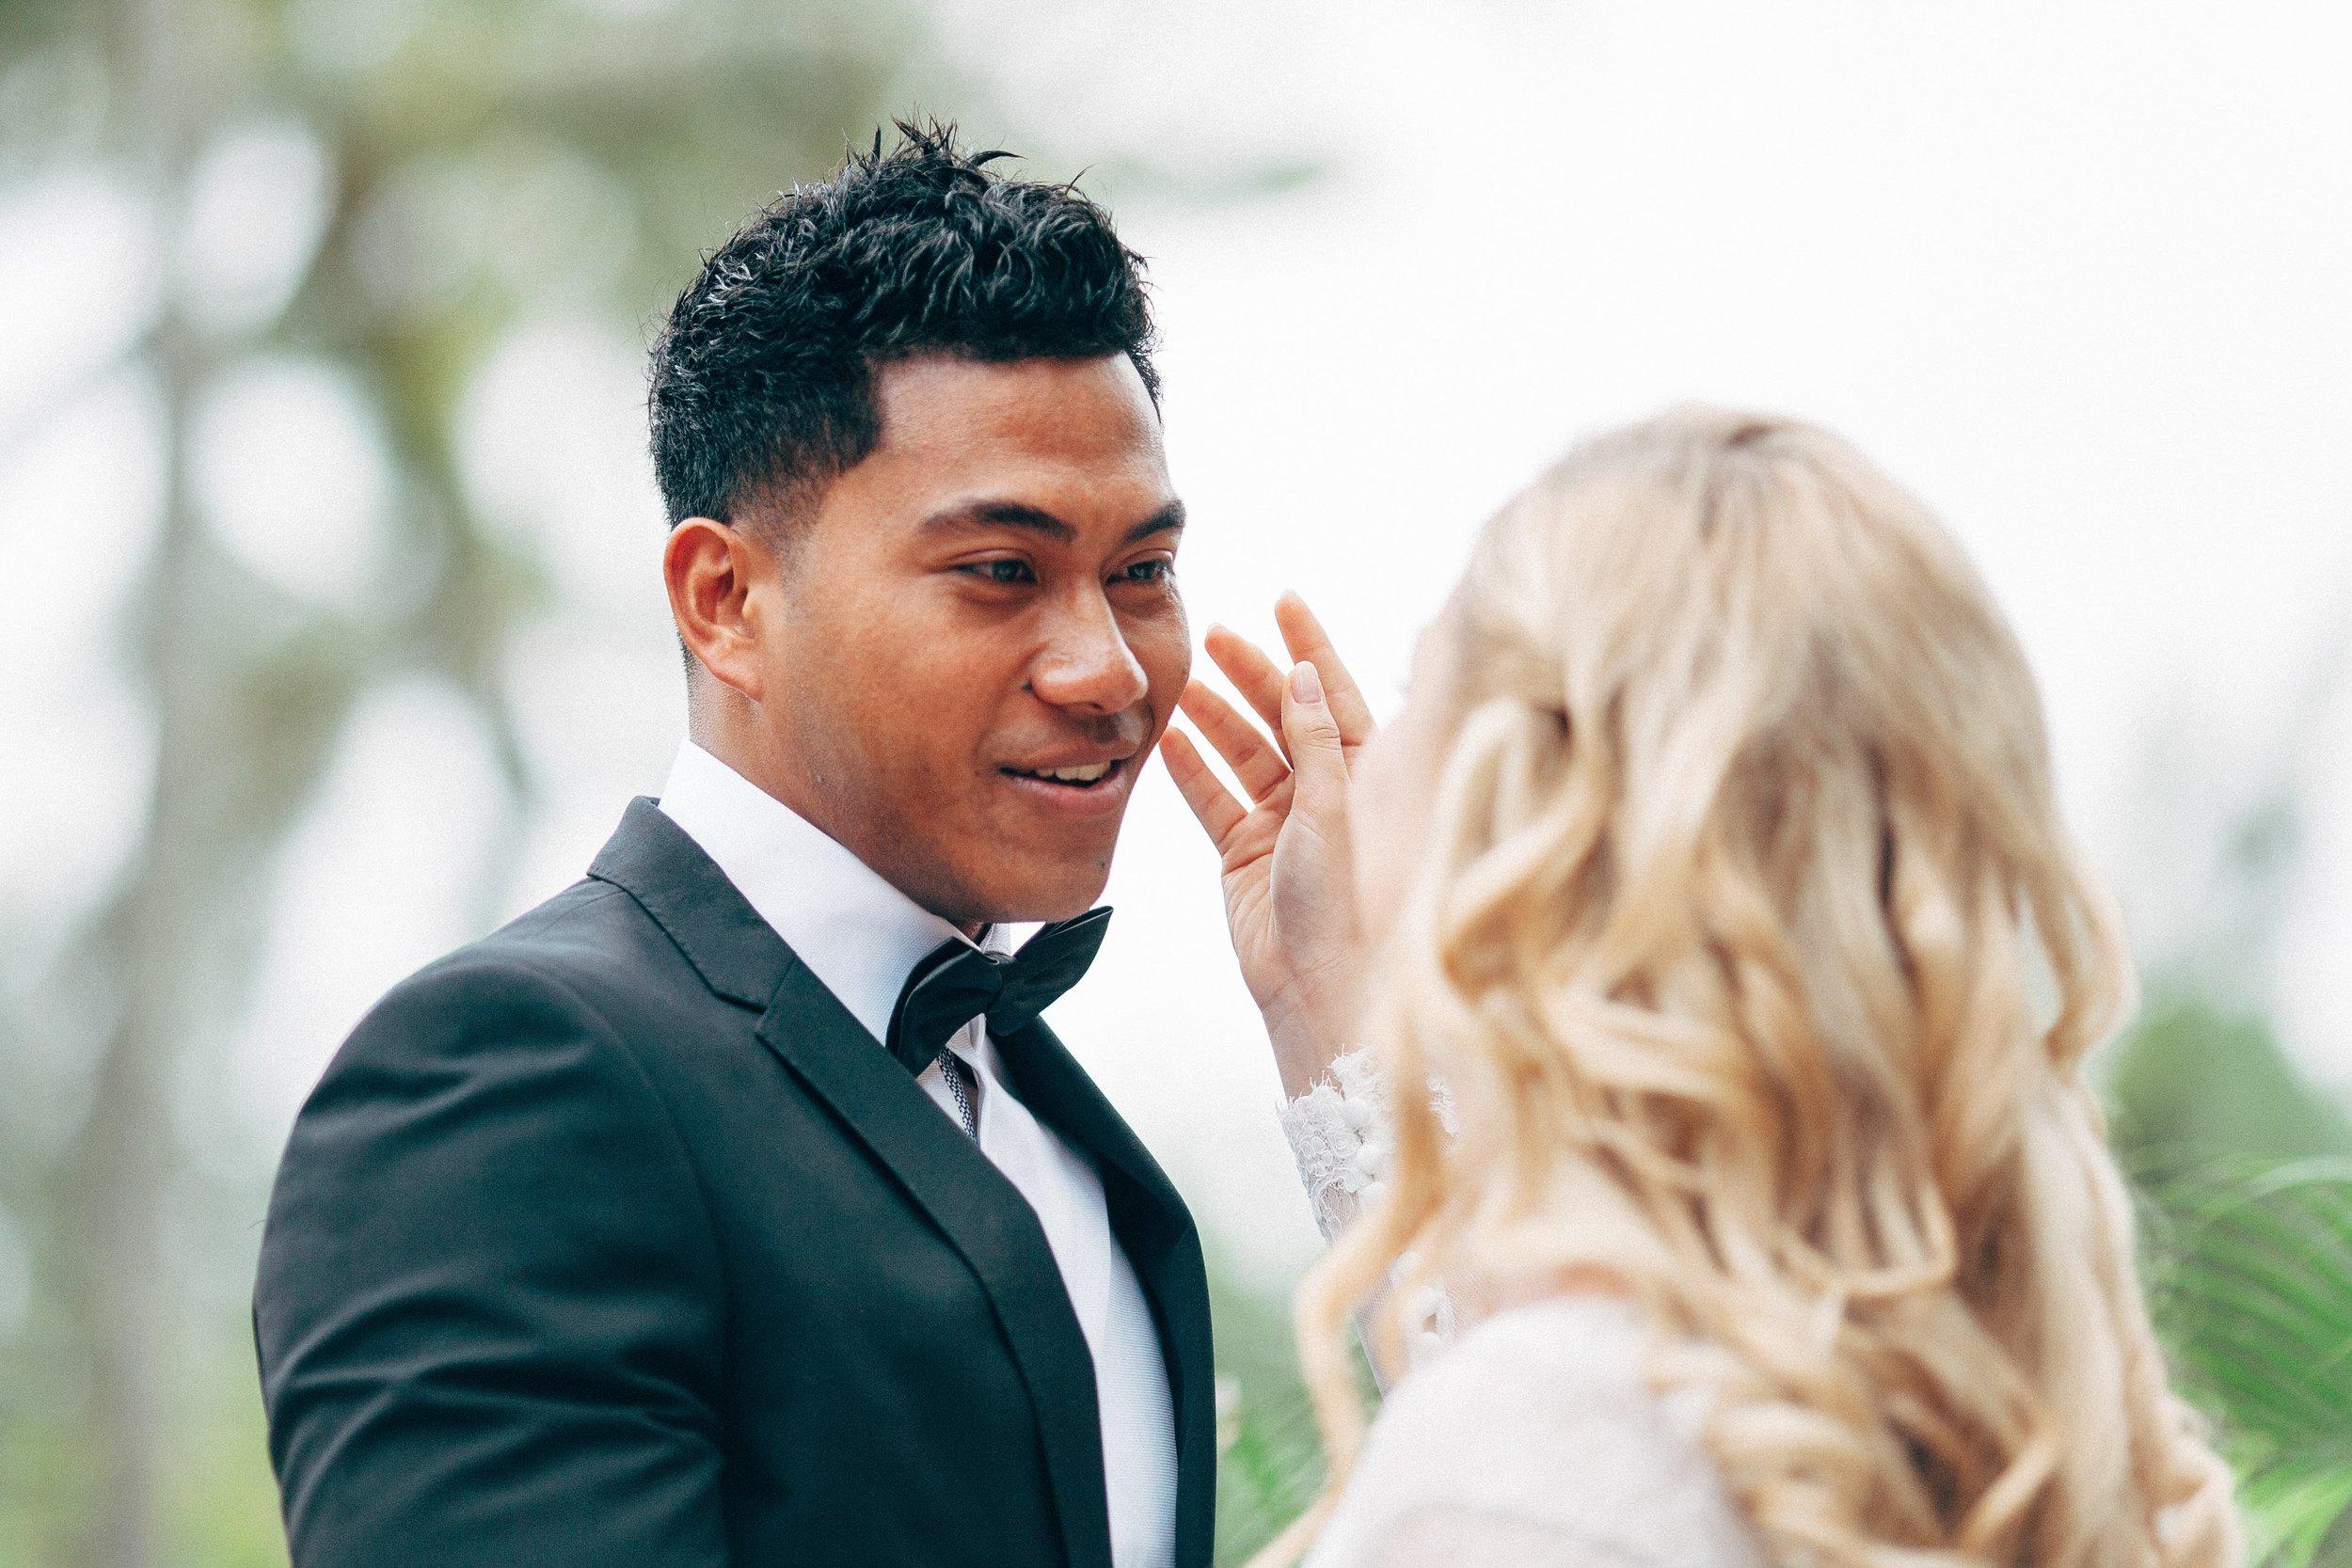 Etu when he first saw Lois on their wedding day.